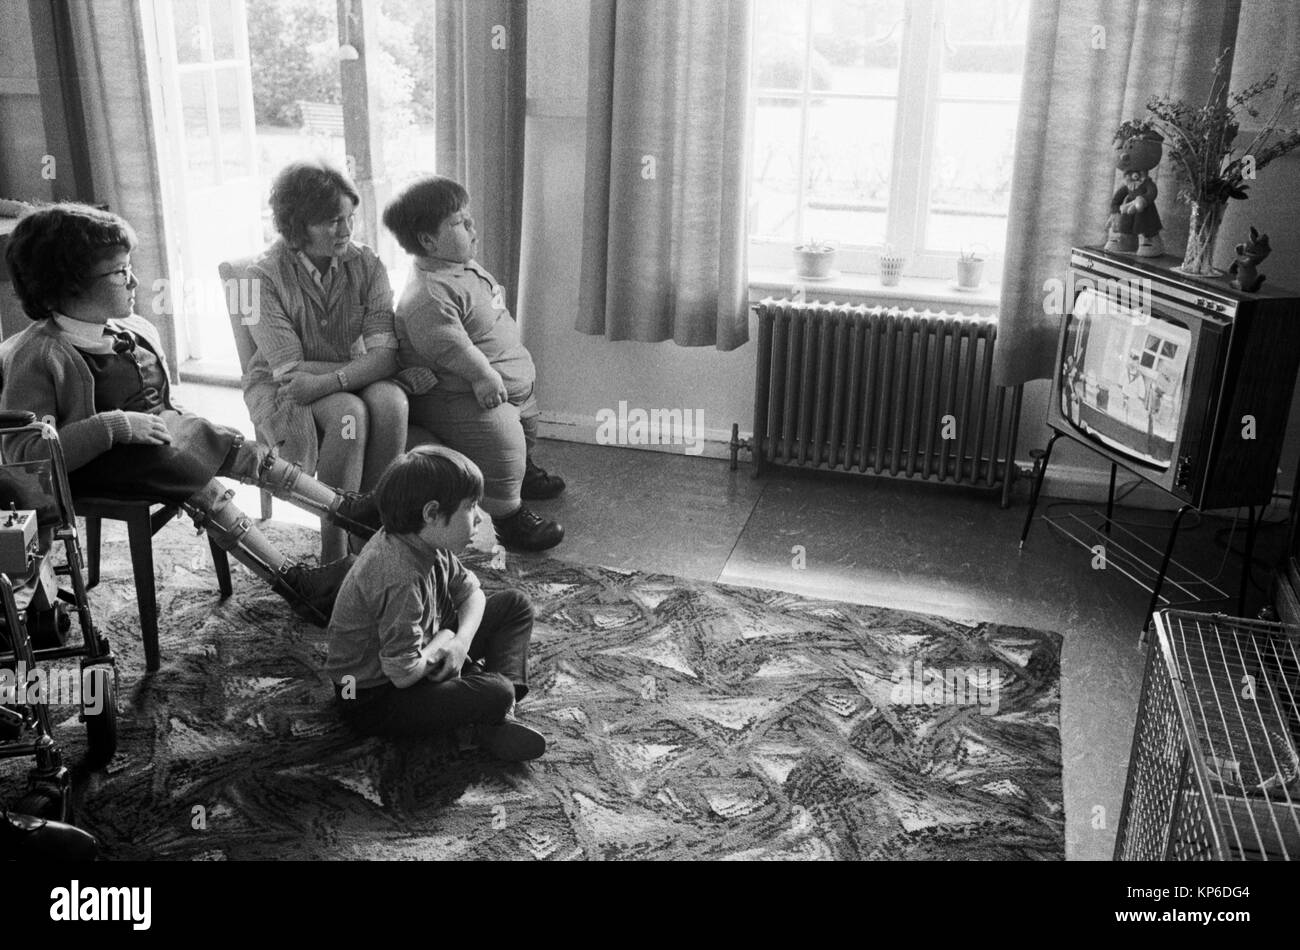 National Children's Home 1970 s UK England Kinder Fernsehen 70 s Großbritannien HOMER SYKES Stockbild